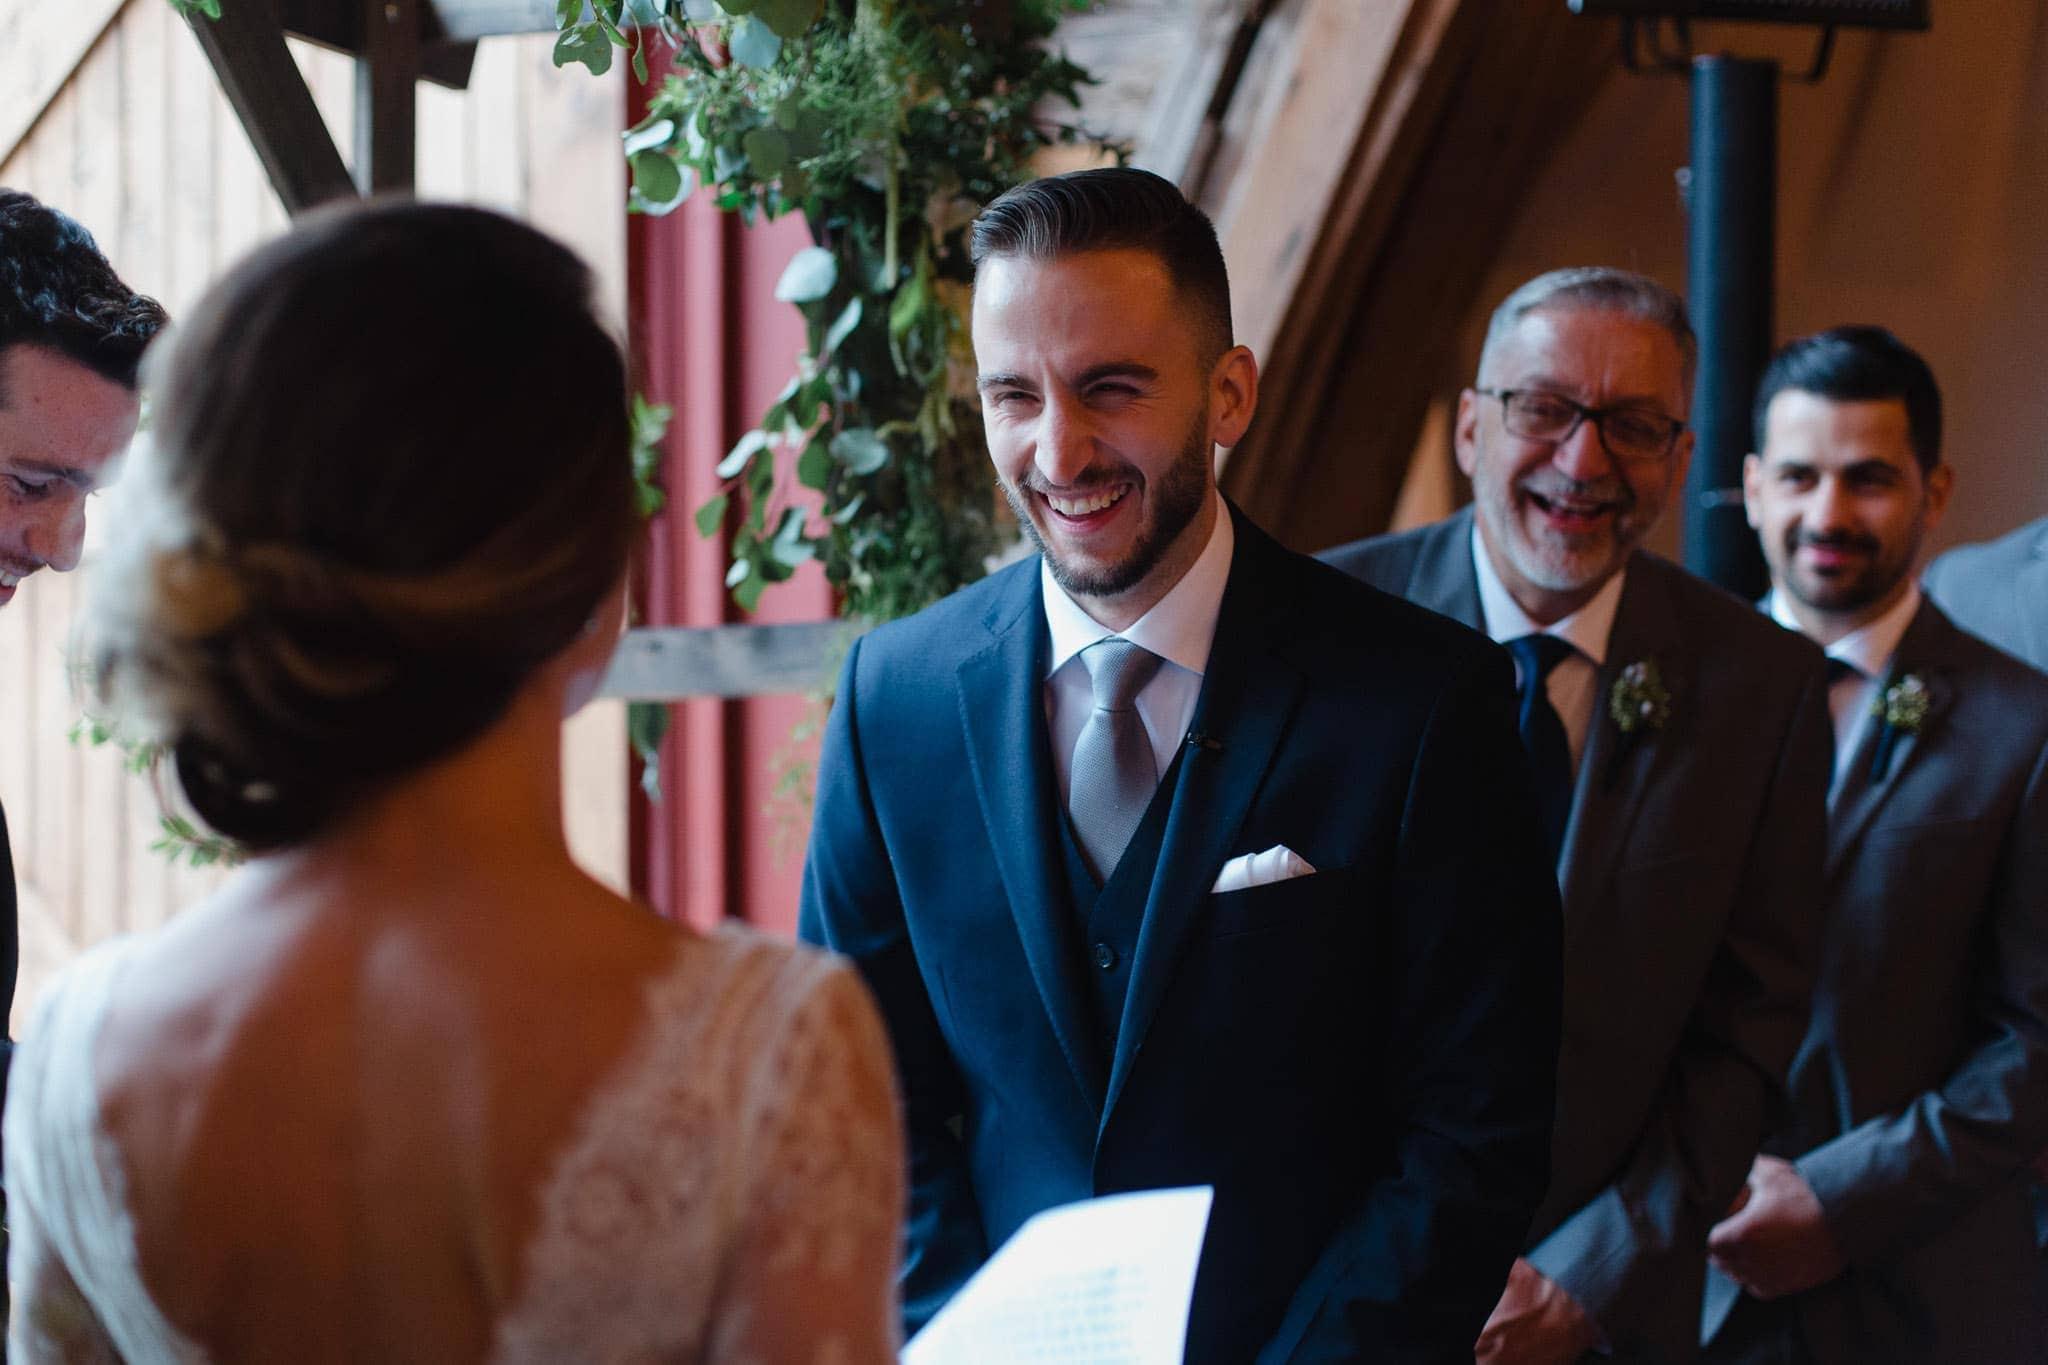 hayloft-on-the-arch-wedding-40